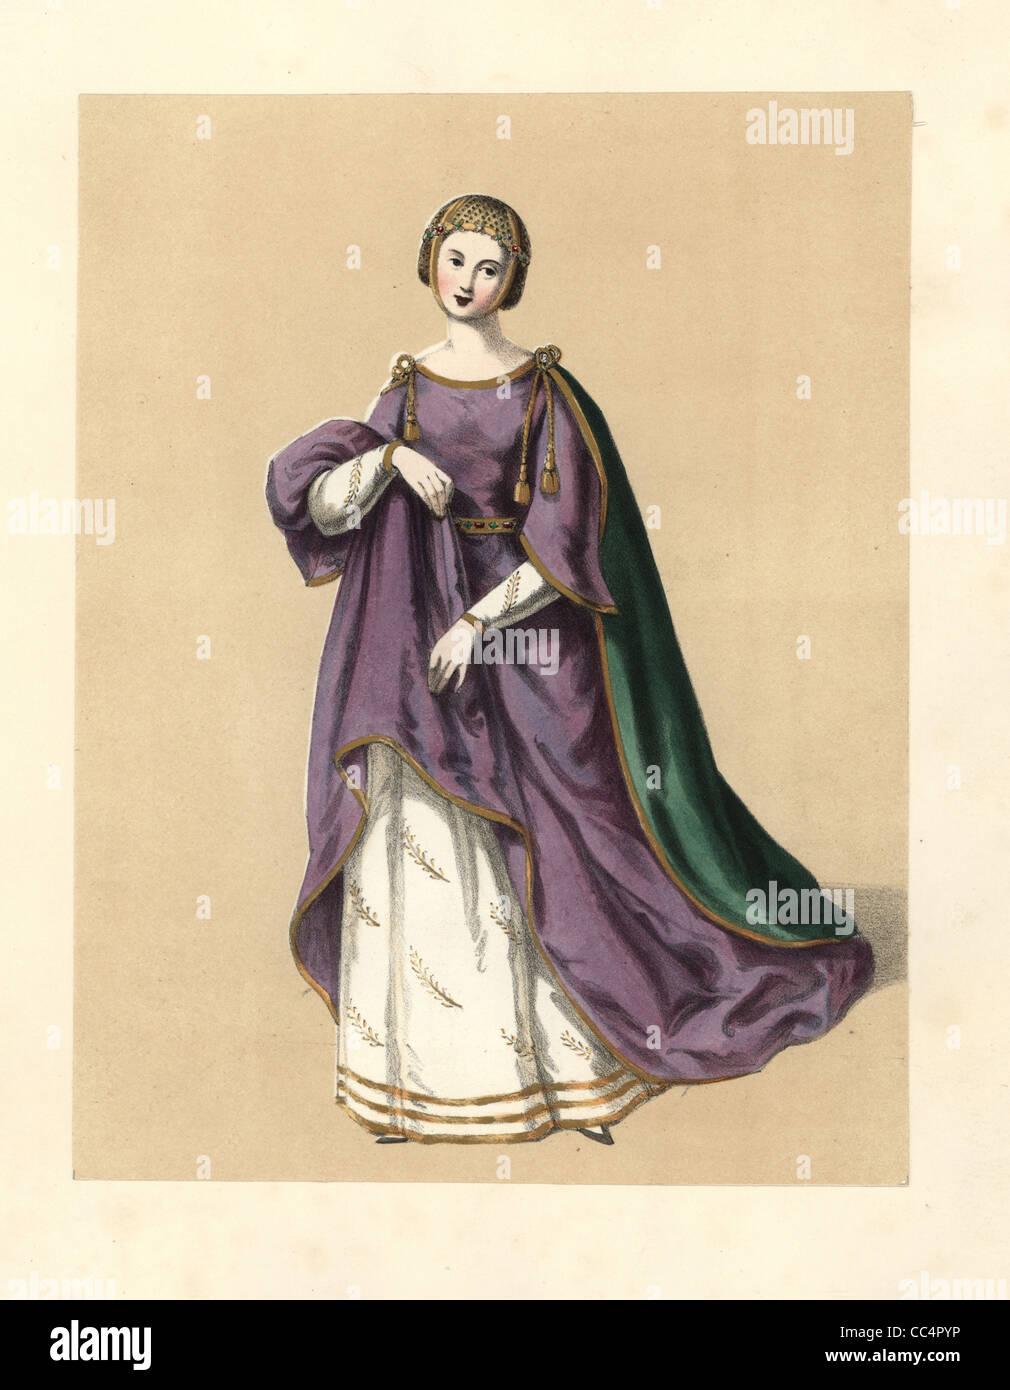 Robe du règne du roi Édouard I, Longshanks. Photo Stock